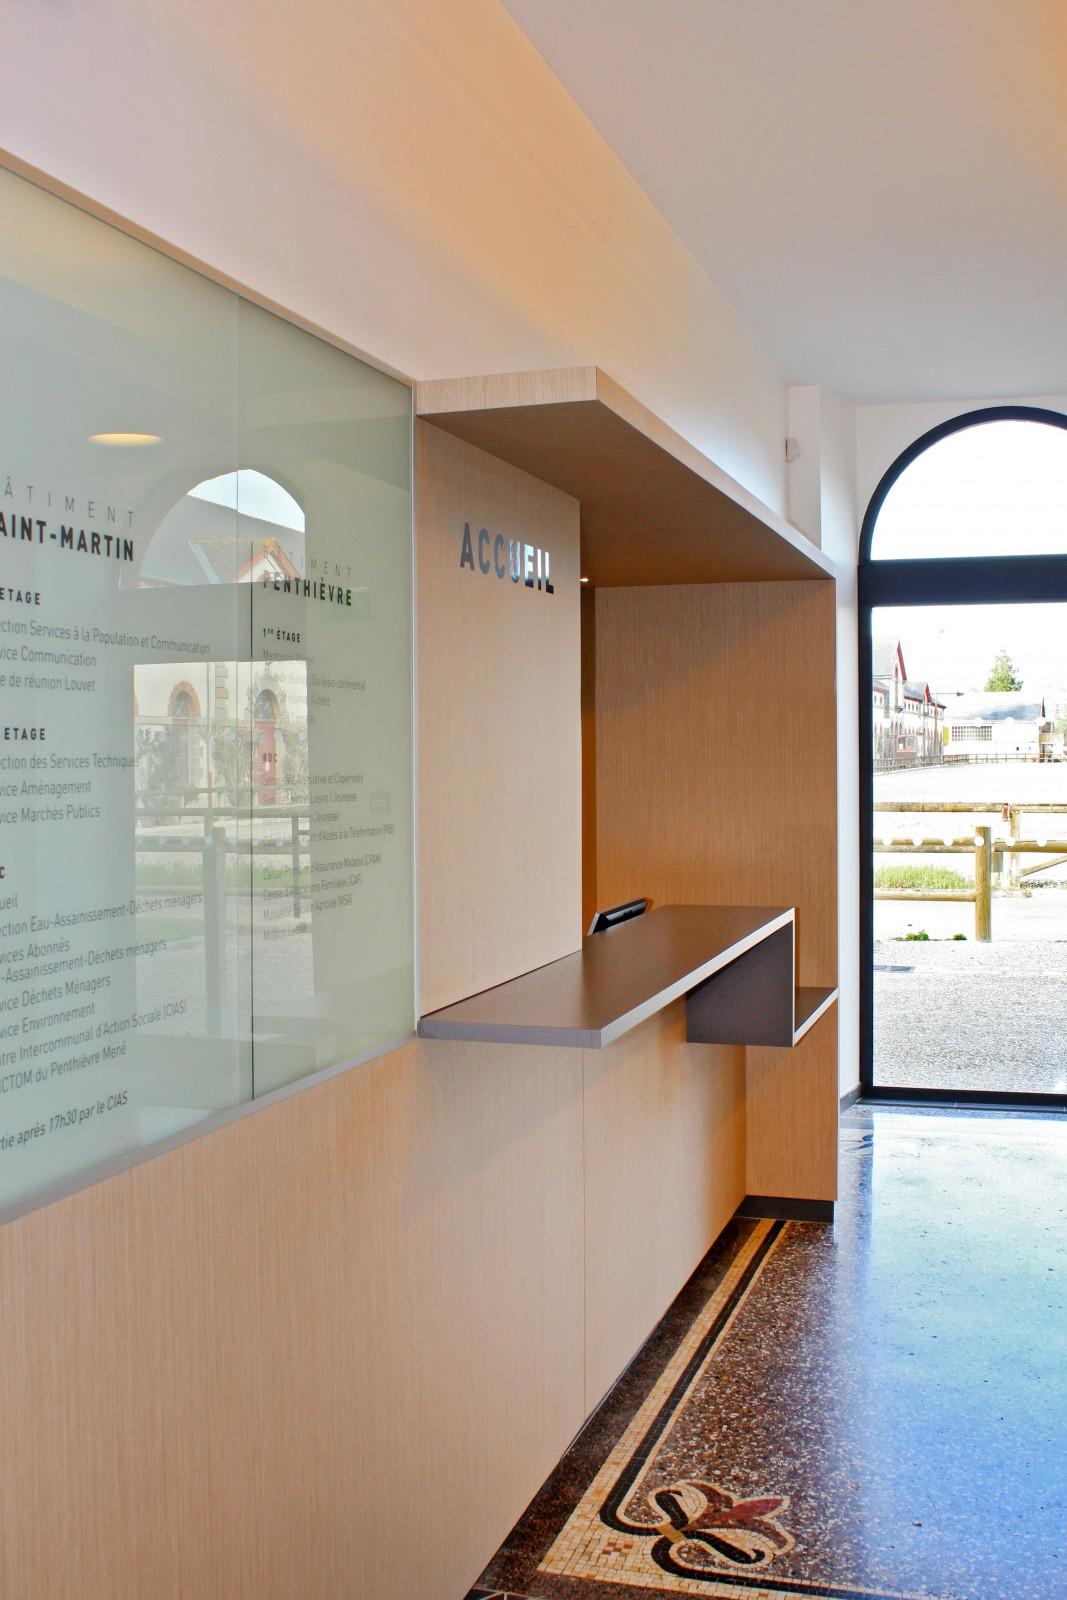 haras-lamballe-reabilitation-communaute-de-commune-interieur-accueil-10